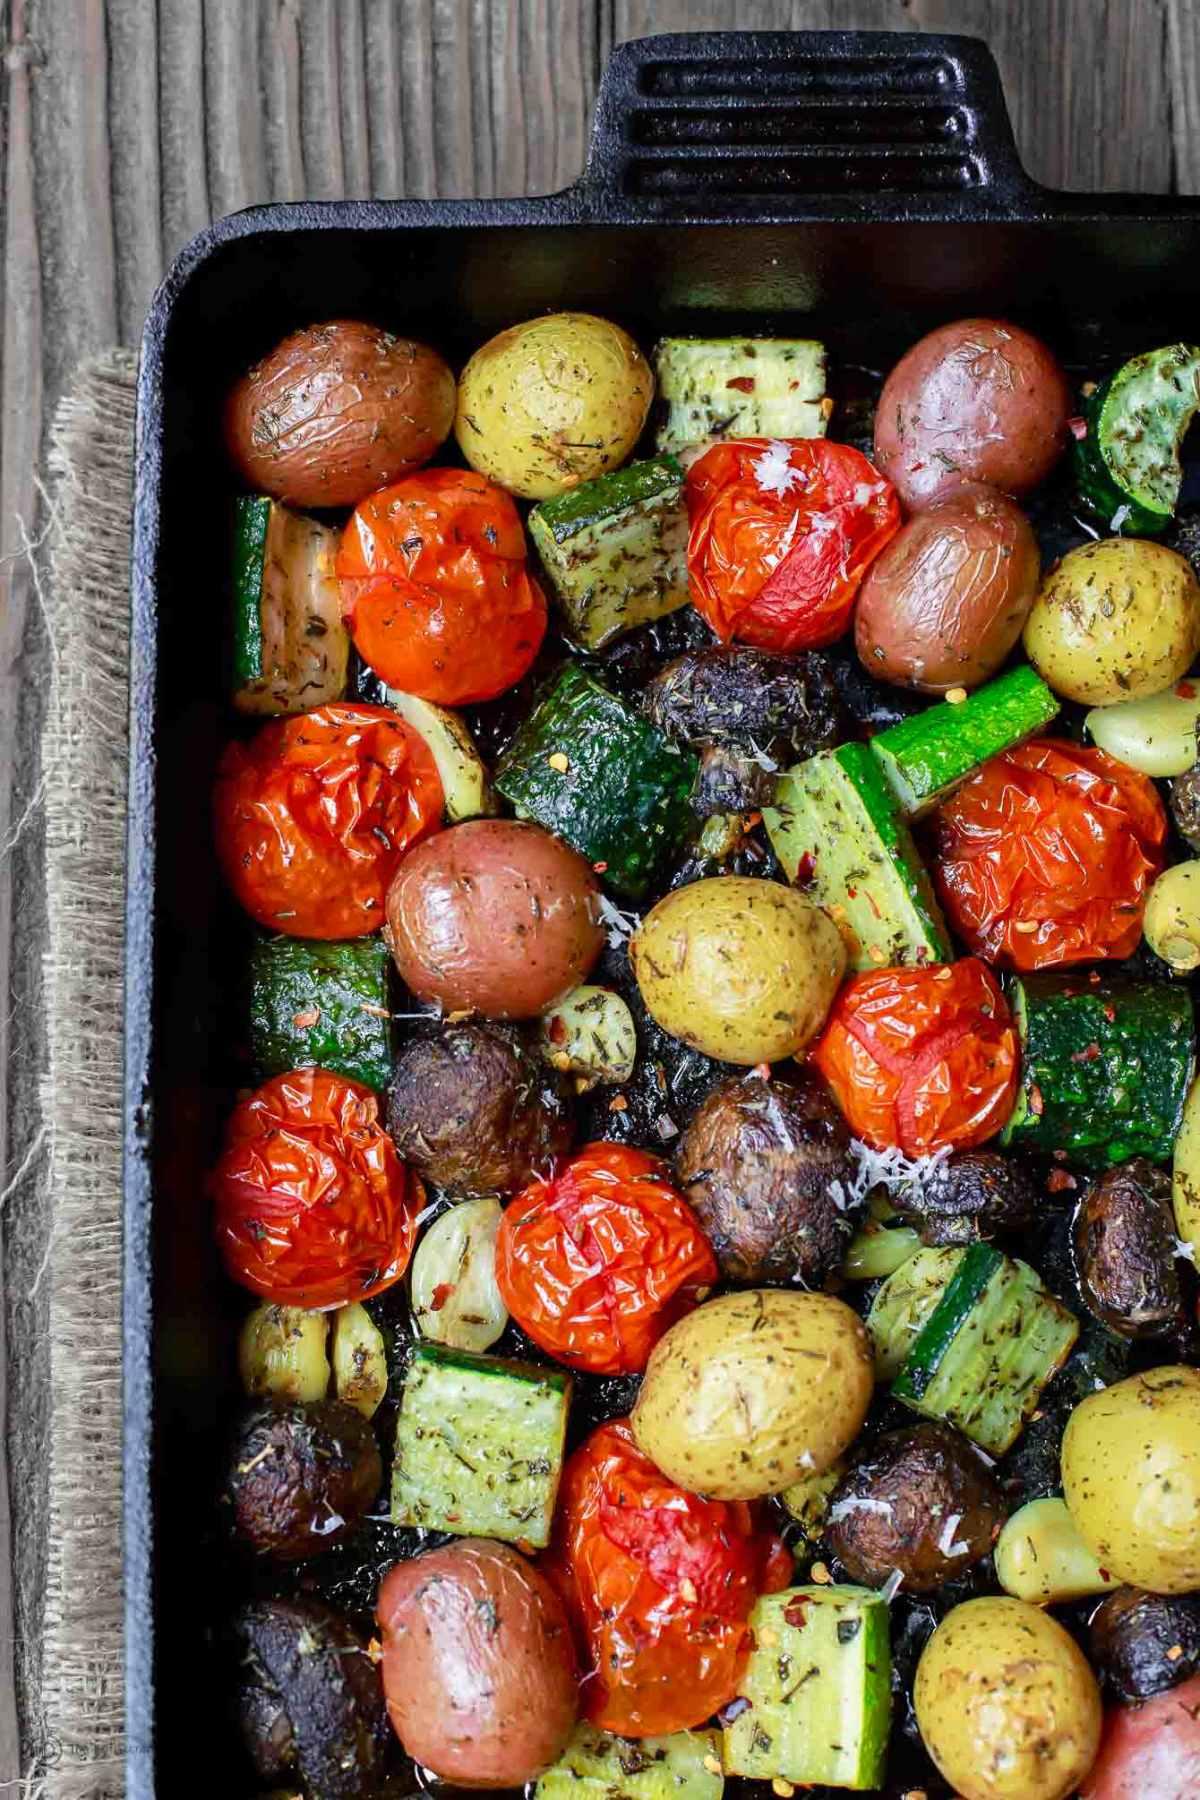 Italian Oven Roasted Vegetables The Mediterranean Dish 3